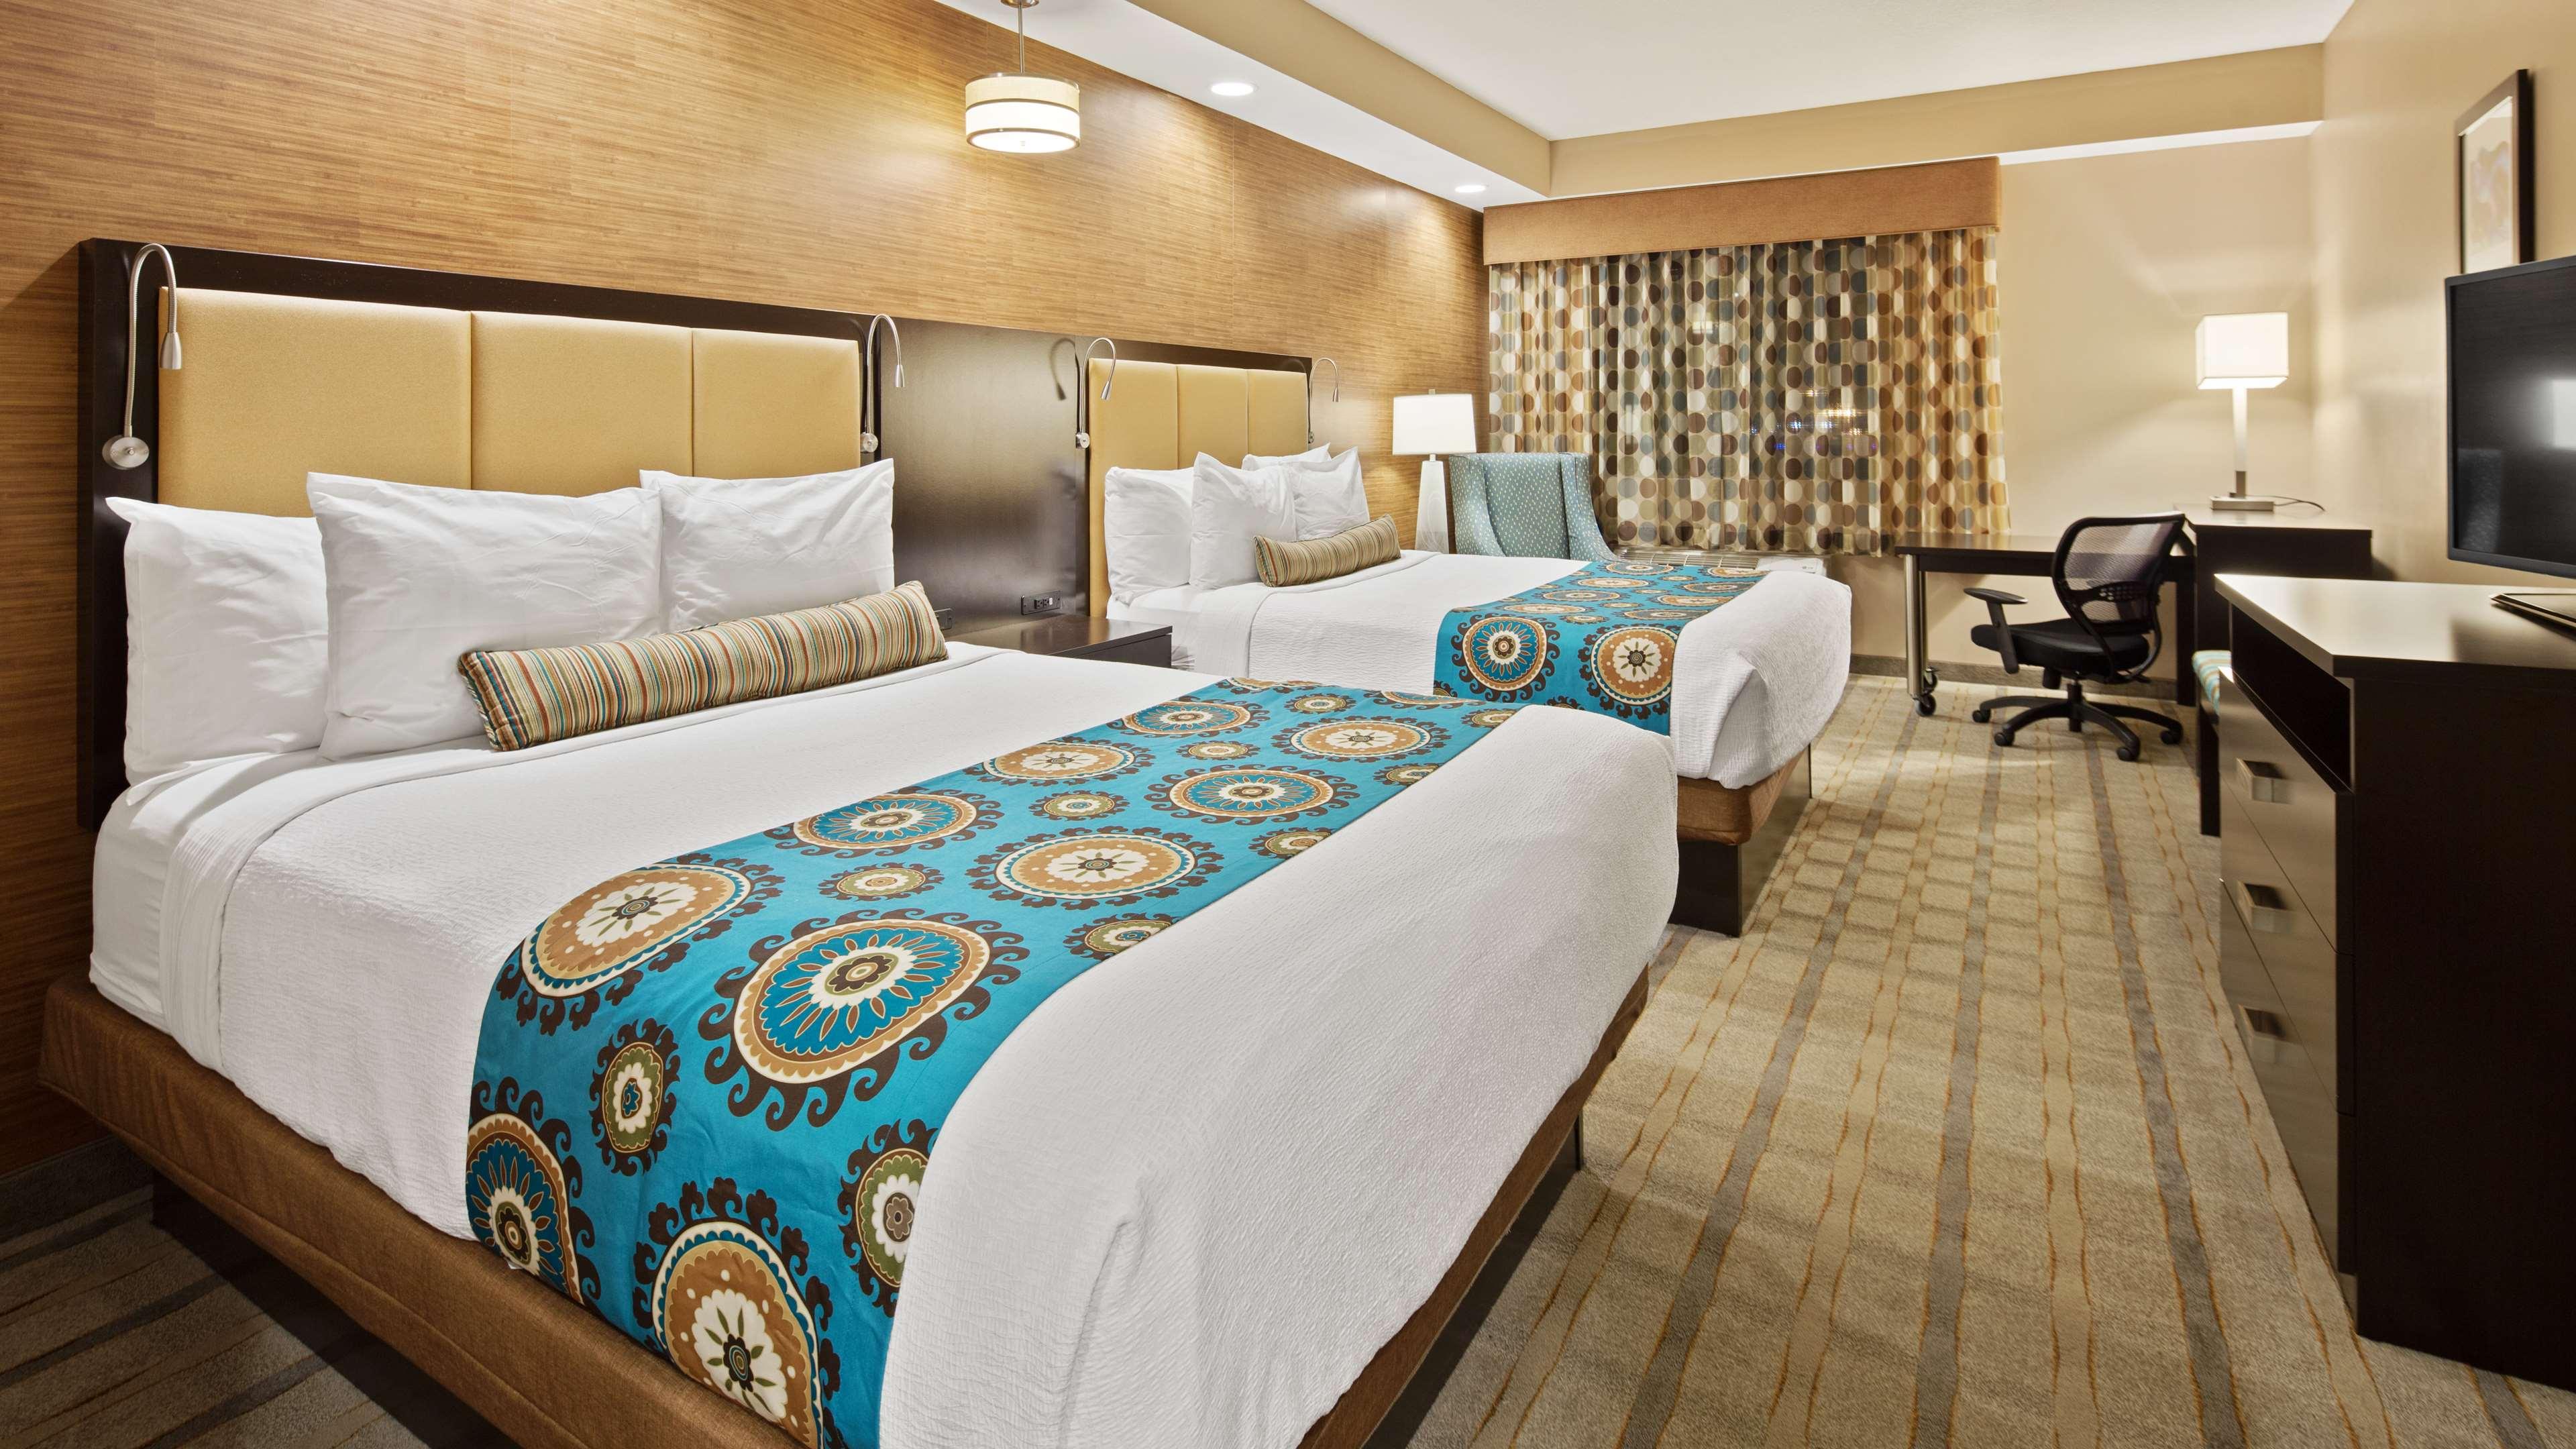 Best Western Plus Kendall Airport Hotel & Suites image 17